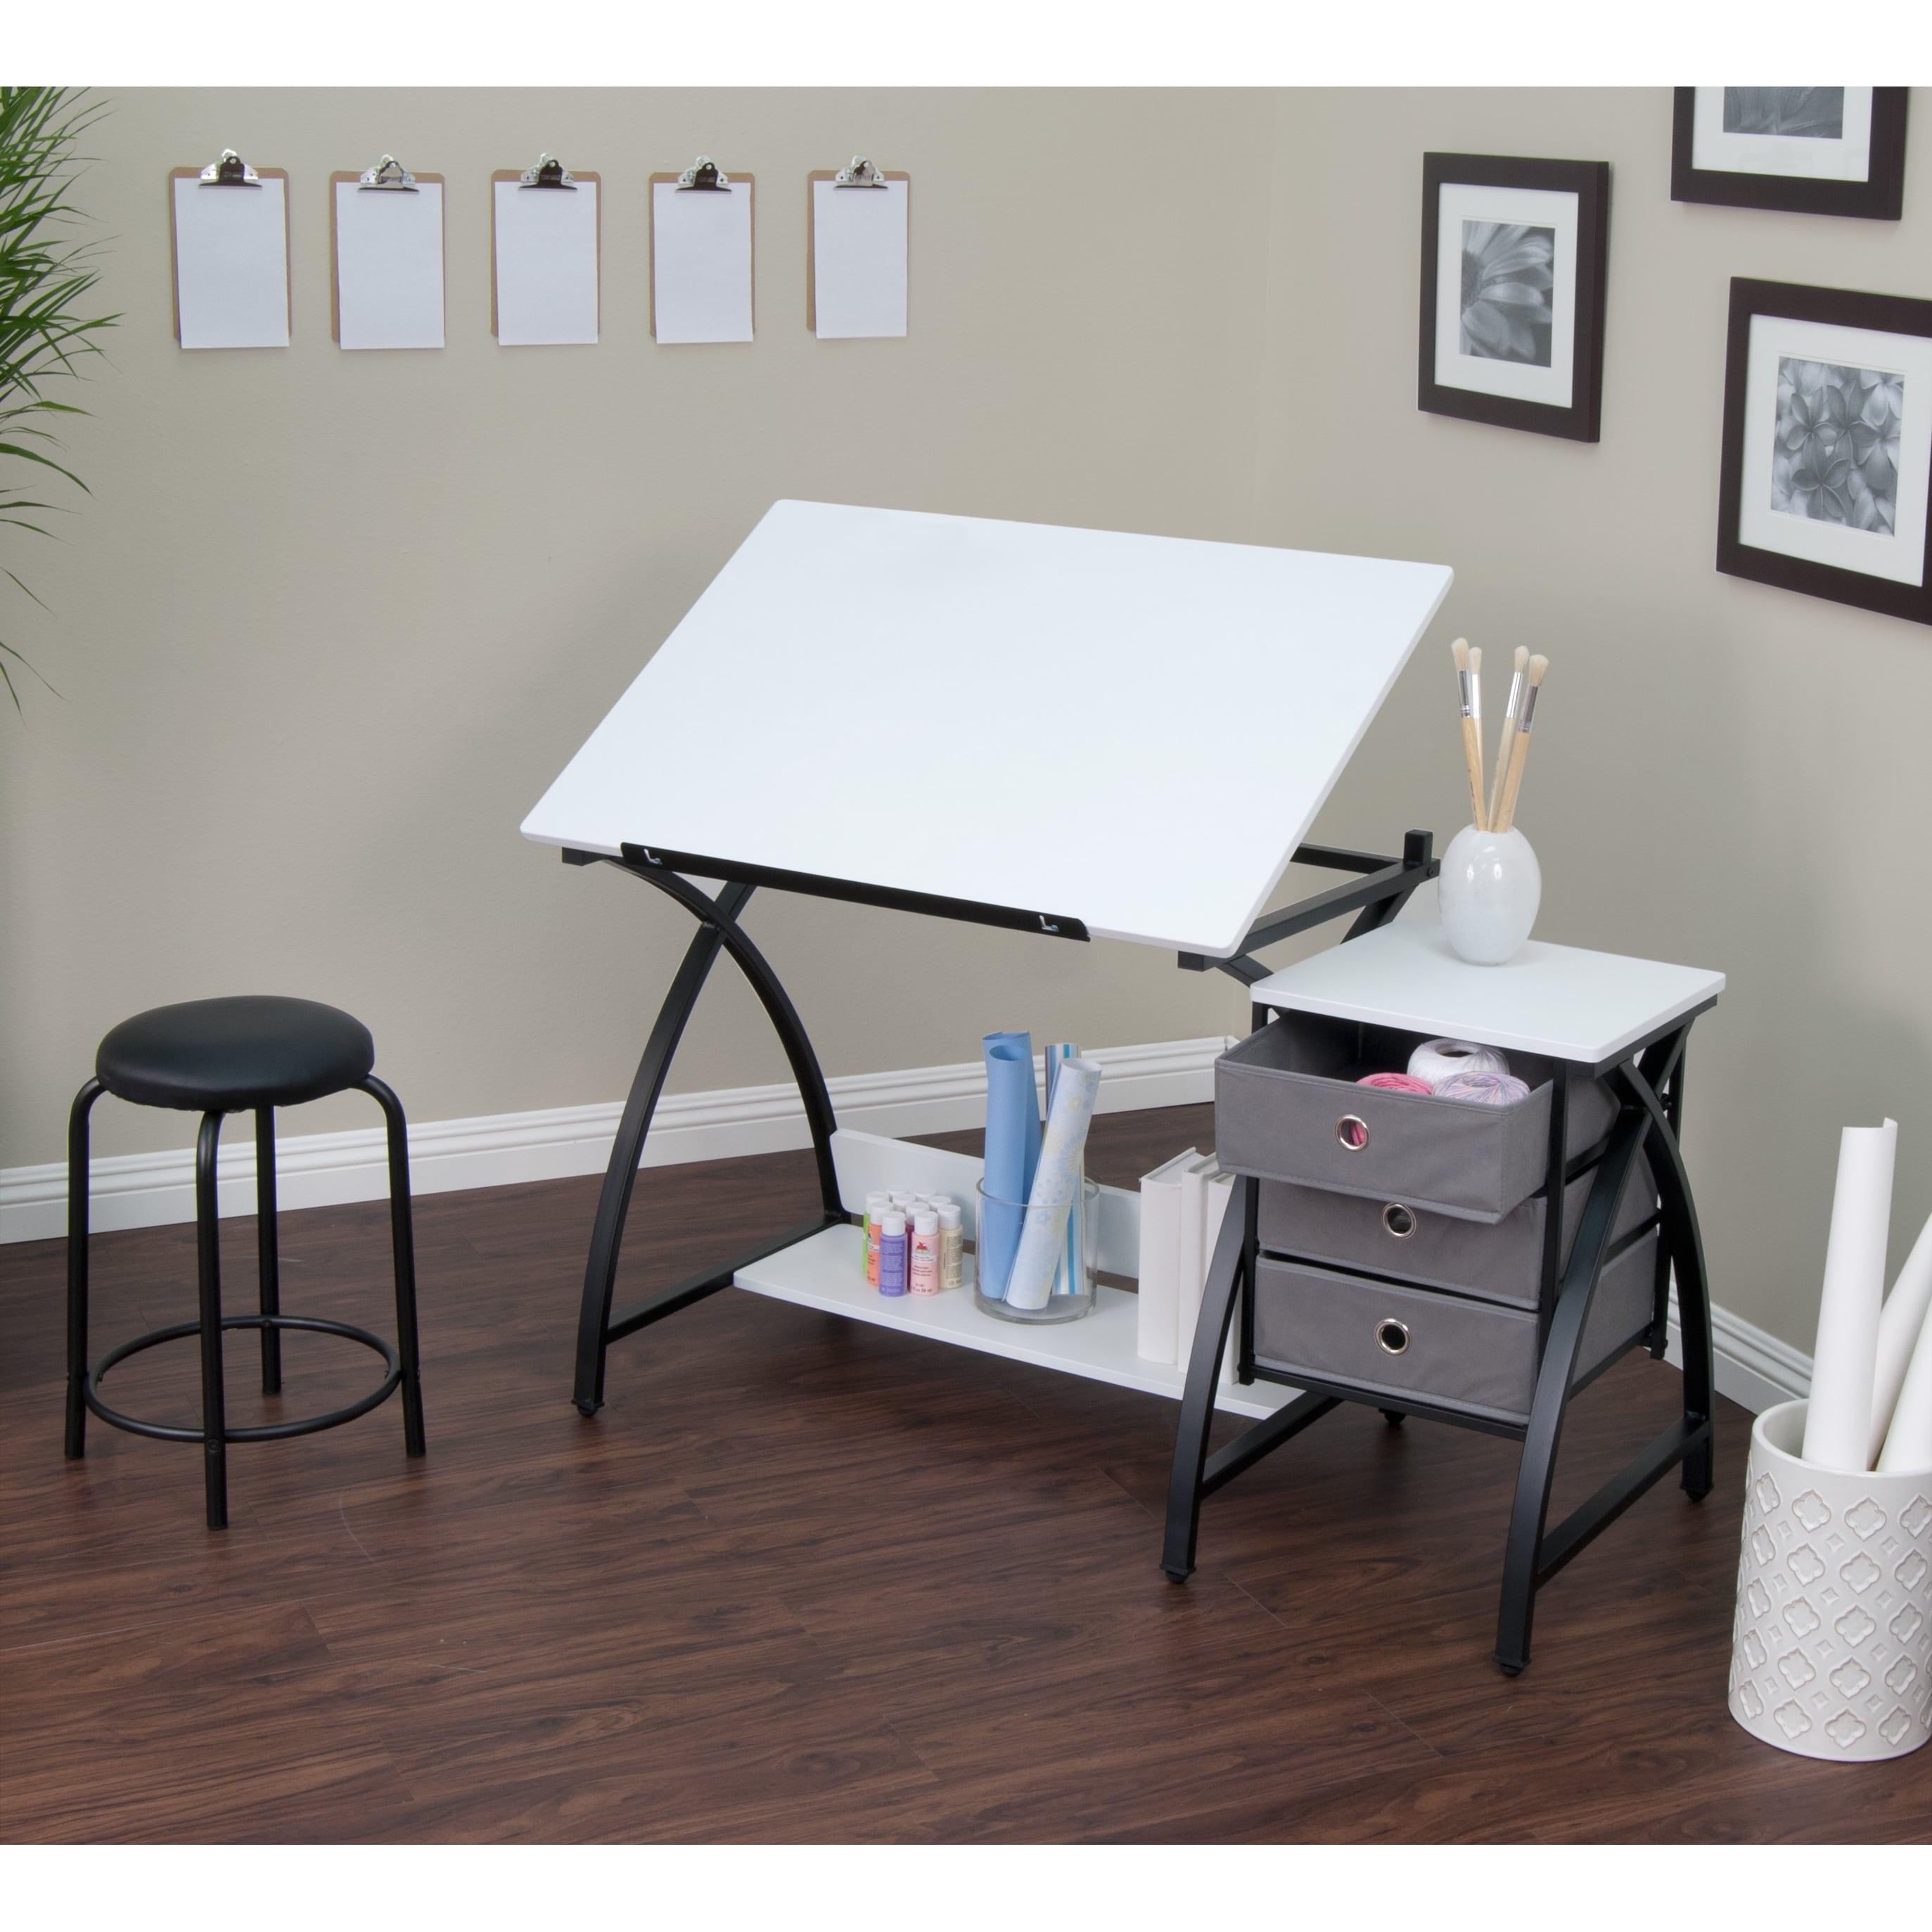 Studio Designs Comet Black/White Drafting Hobby Craft Tab...